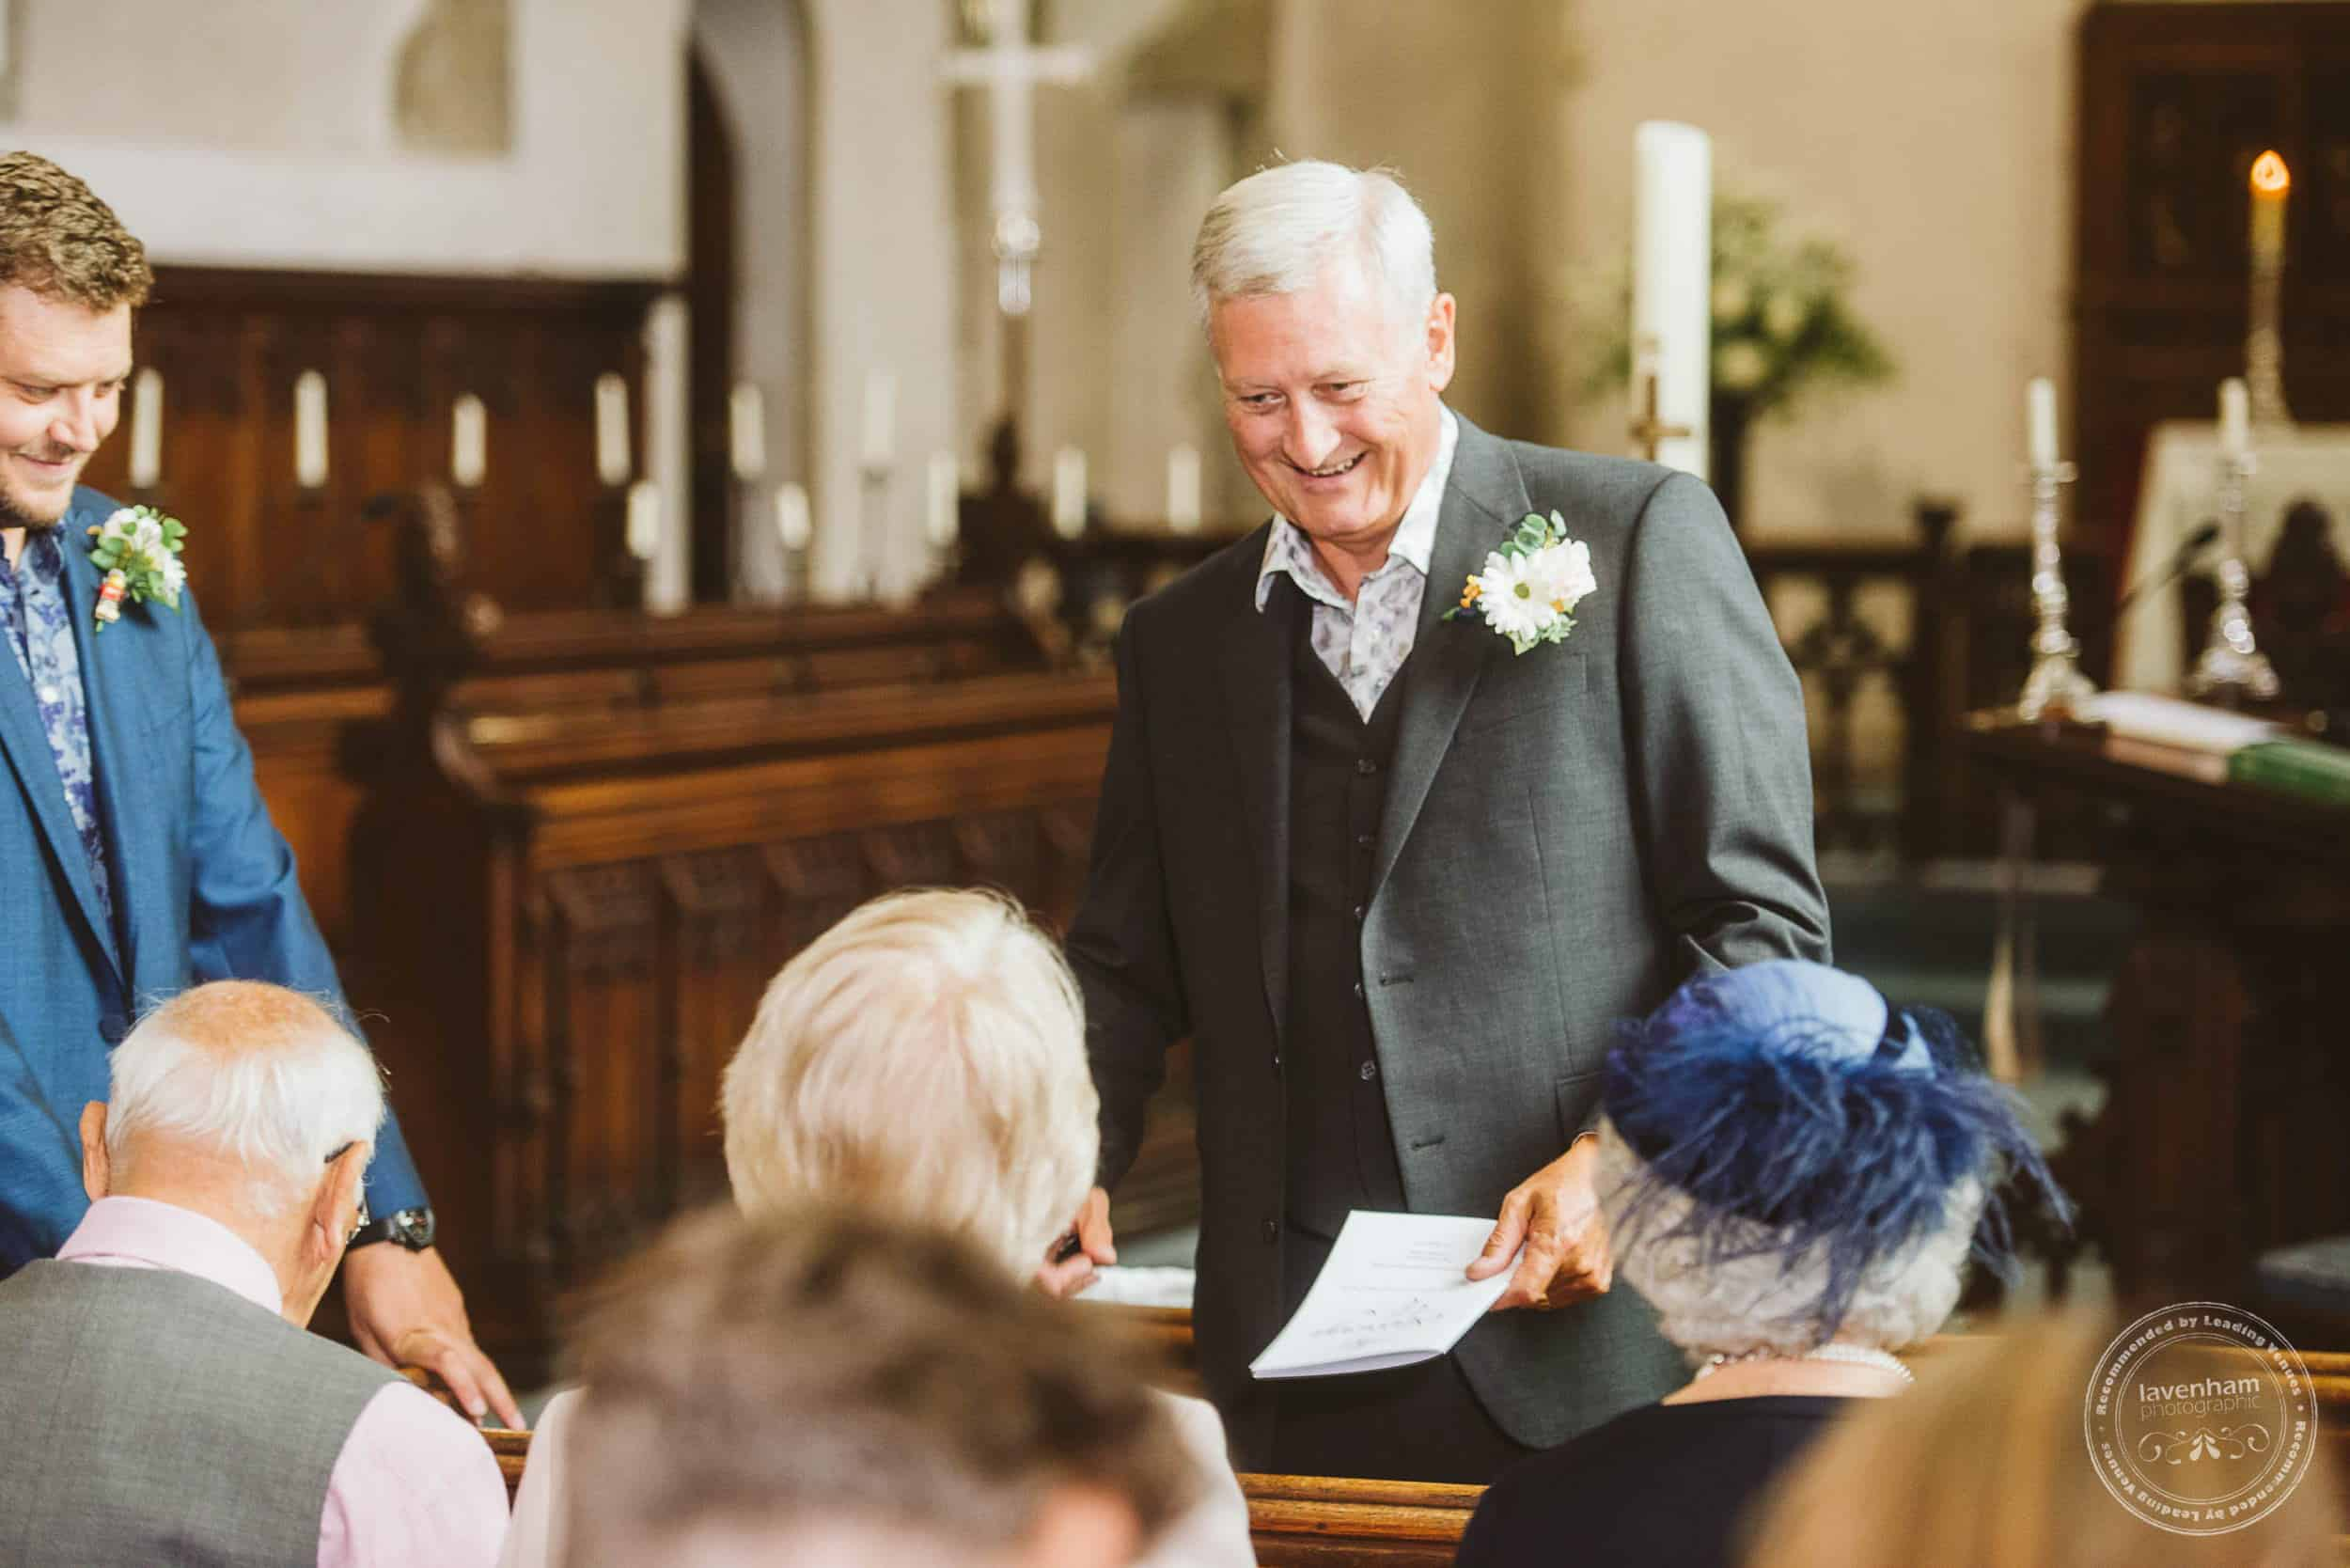 180818 Marks Hall Wedding Photography Lavenham Photographic 029